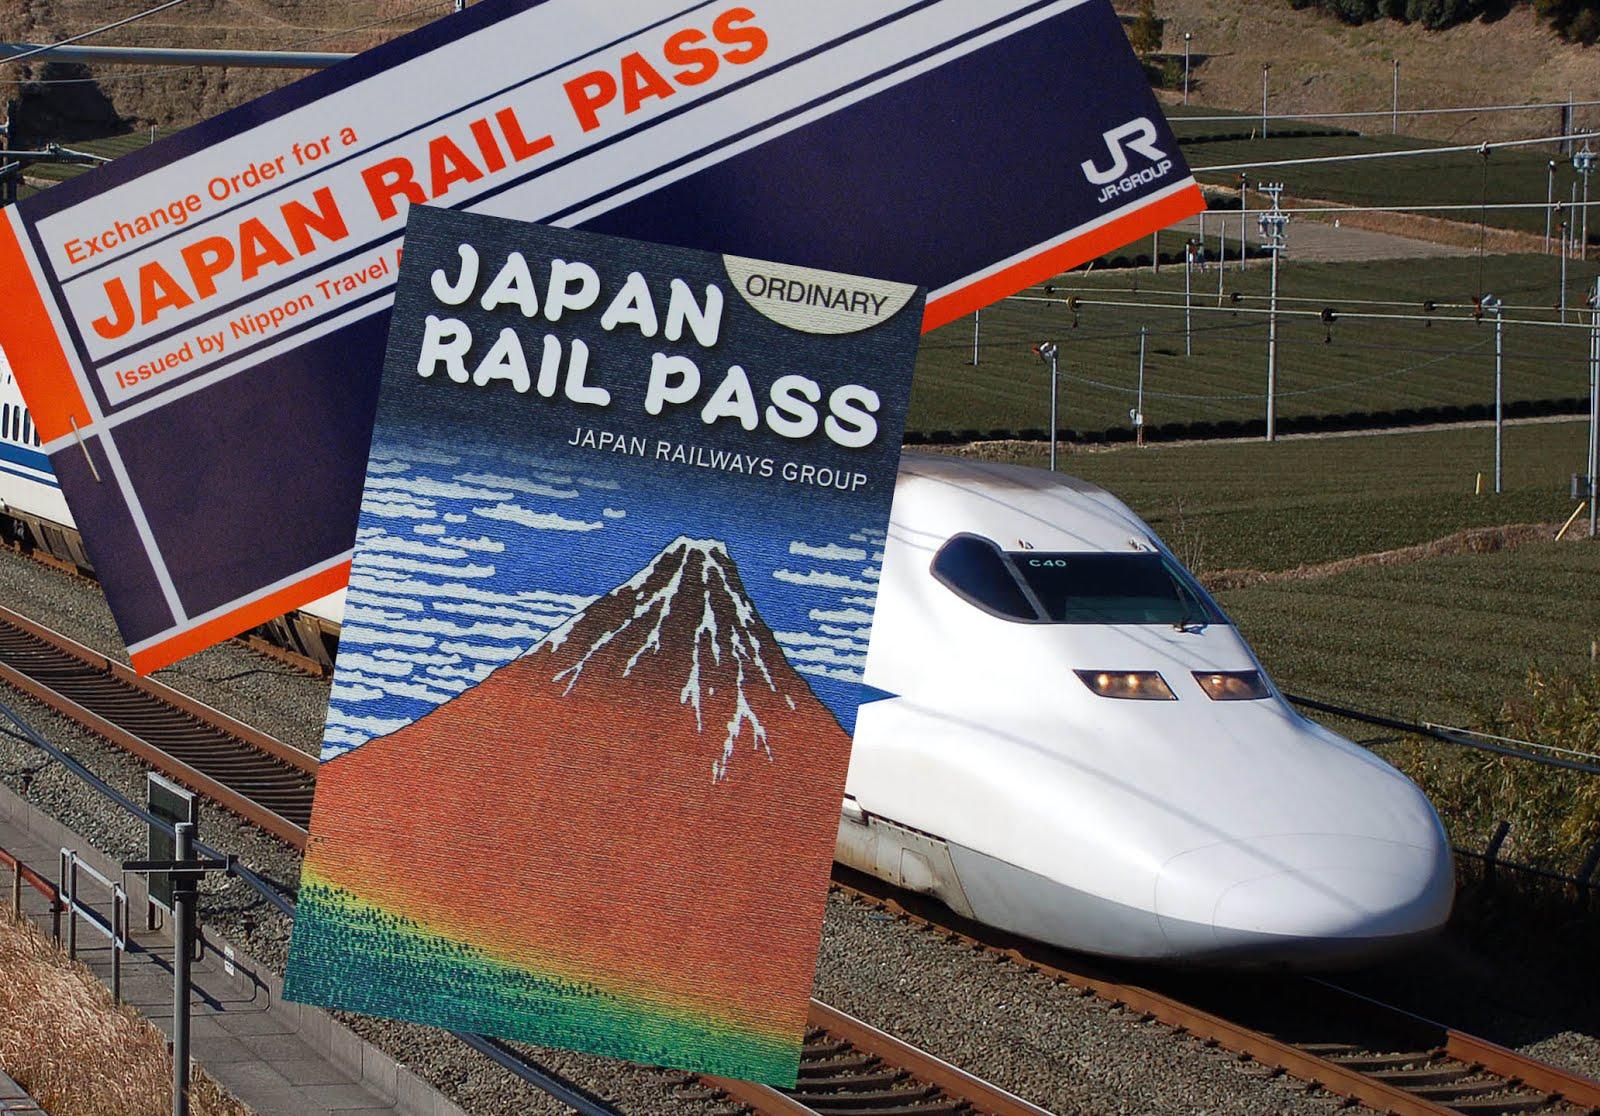 Jalan Sendiri Ajah Takayama Hokuriku Pass 5 Days Jrpass Dewasa Voucher Yang Akan Ditukar Menjadi Ticket Foto Wikimediaorg